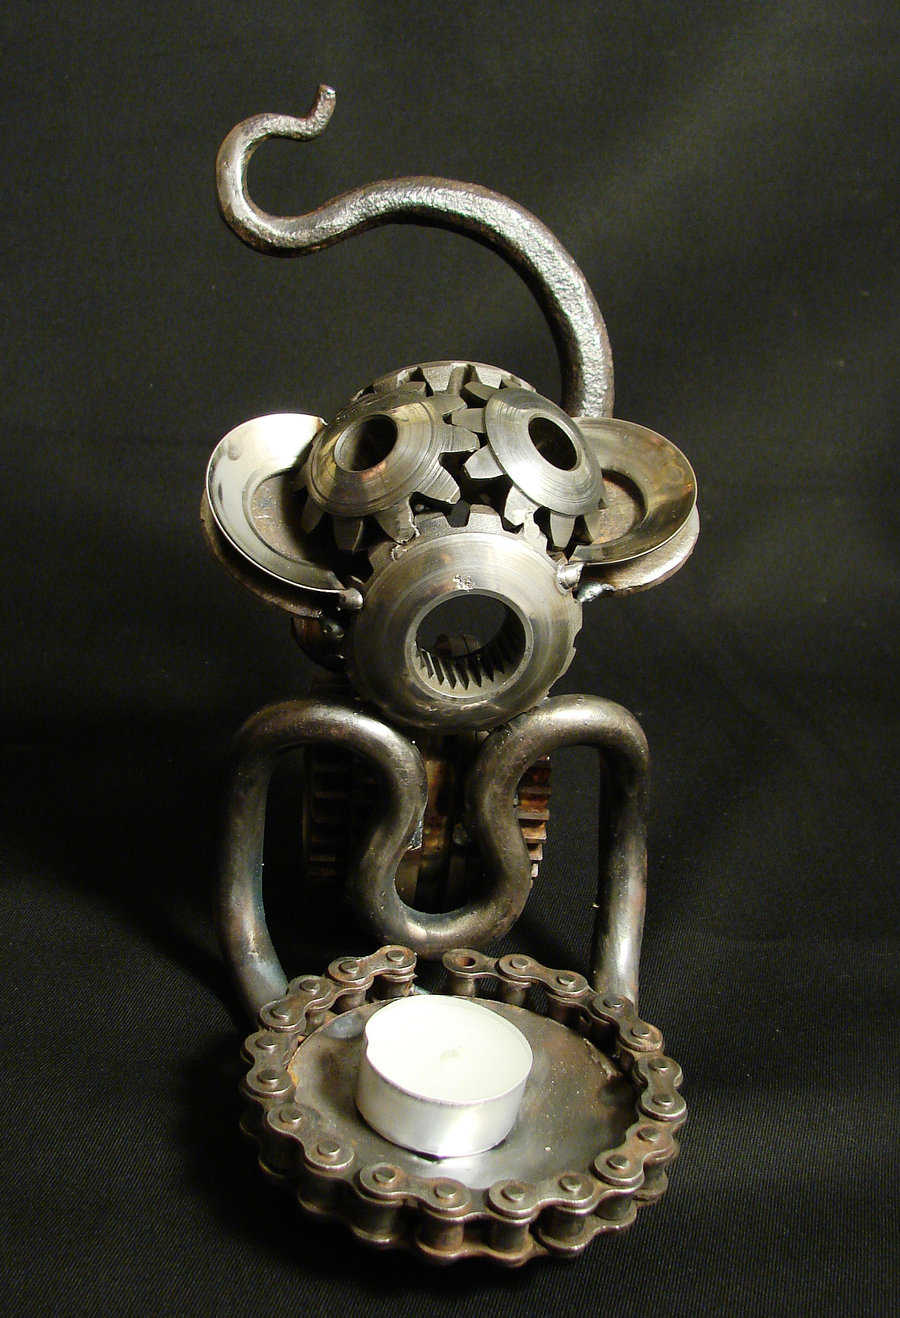 steampunk_monkey_by_metalmorphoses-d49bbsk.jpg